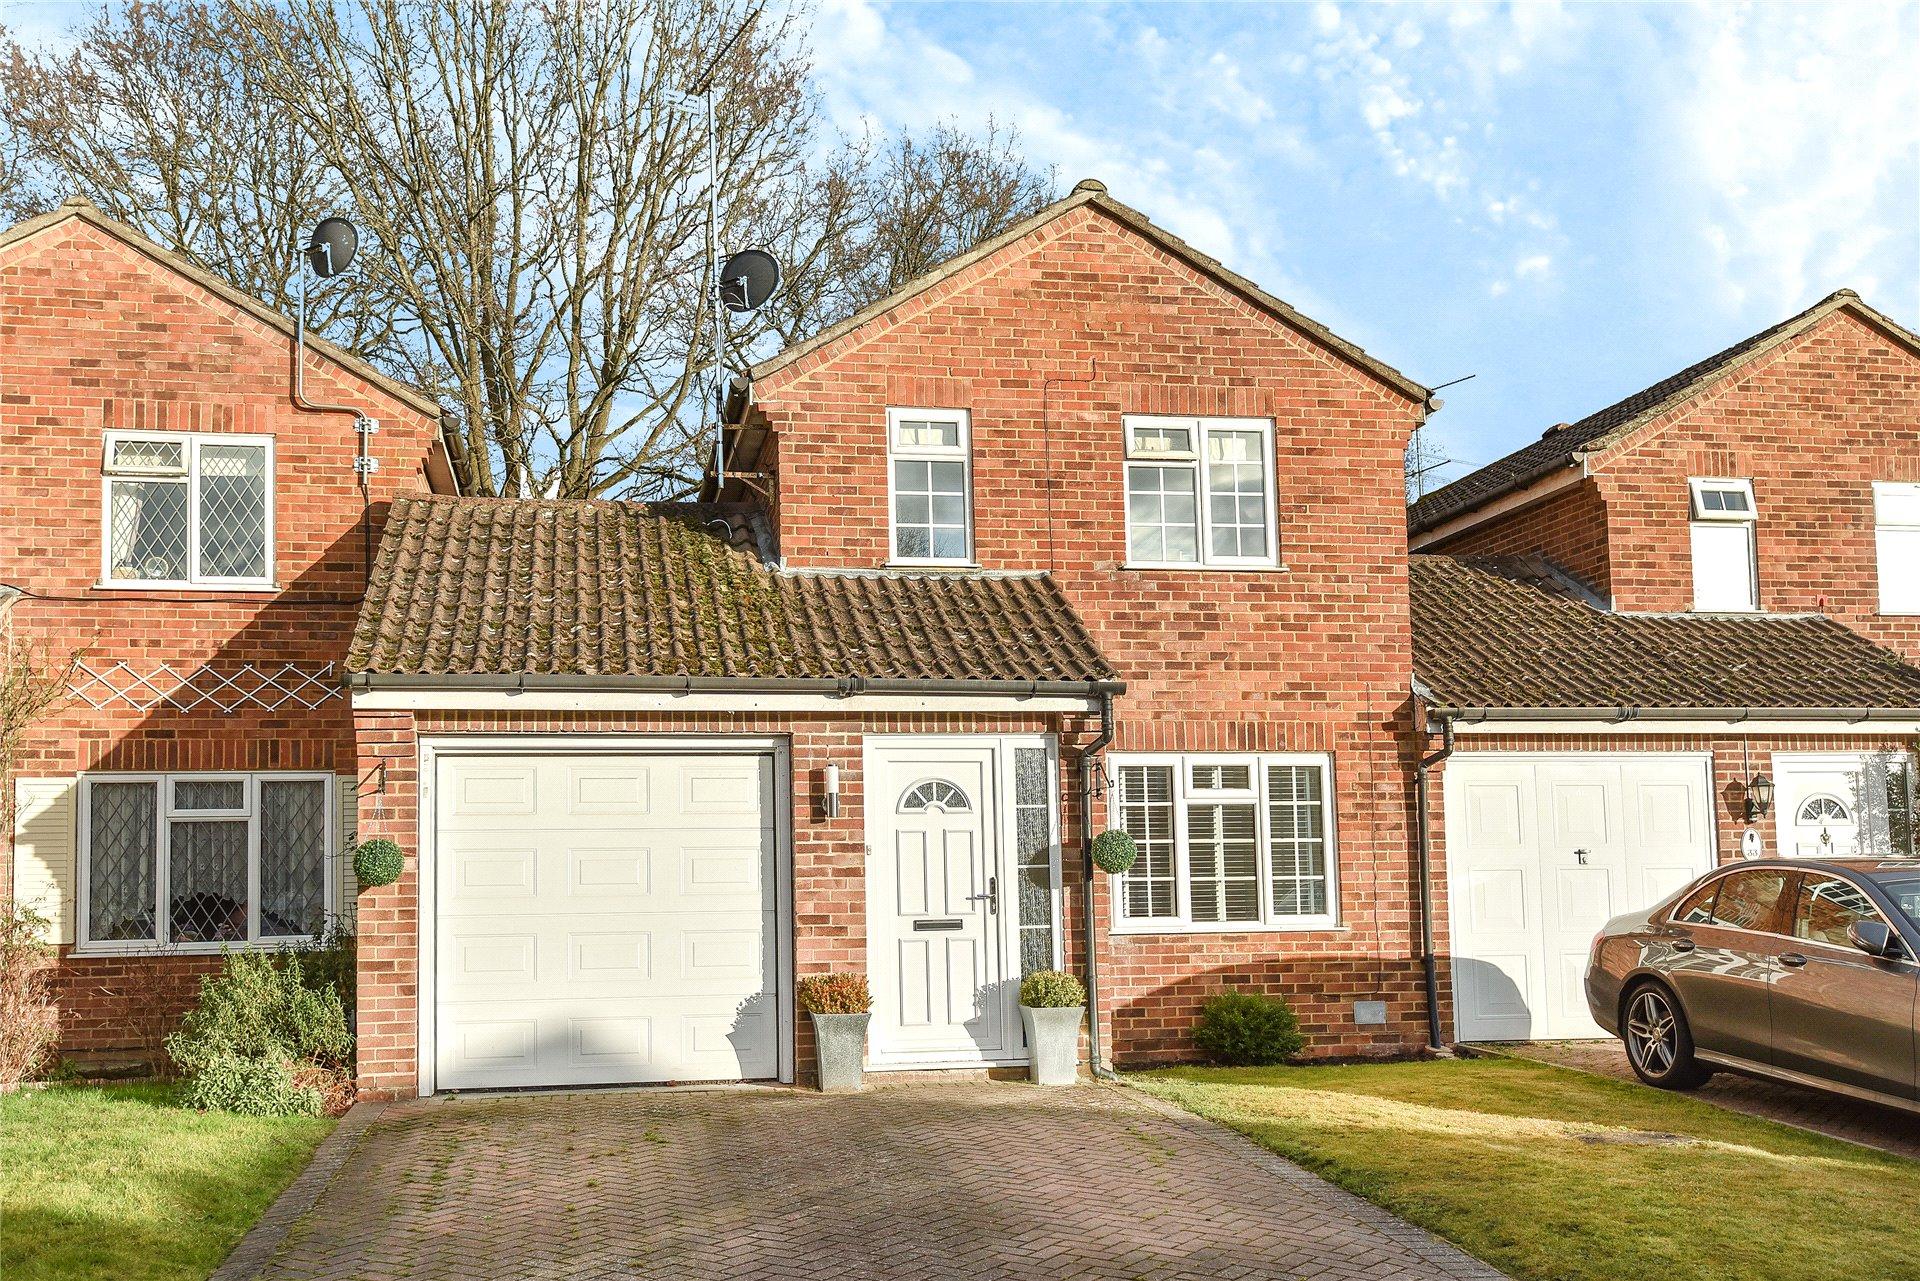 3 Bedrooms Link Detached House for sale in Rother Close, Sandhurst, Berkshire, GU47